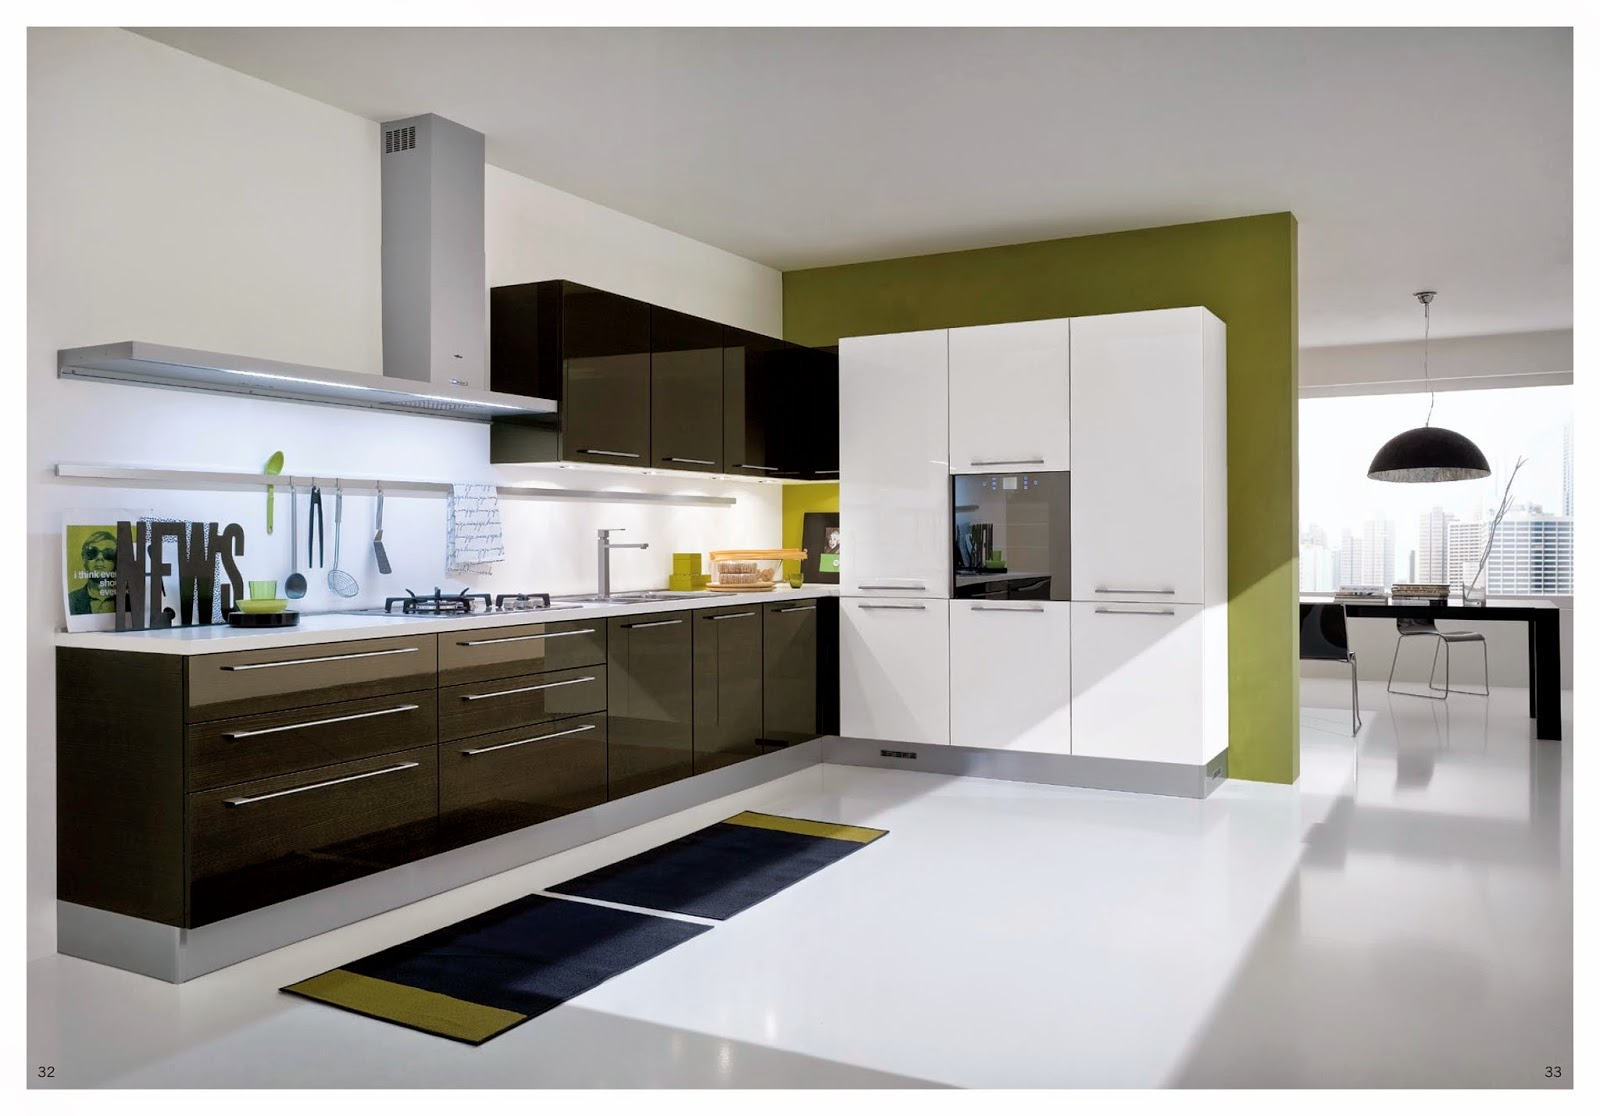 Kitchen Best Design Your Blog Description Kitchen Design London Uk